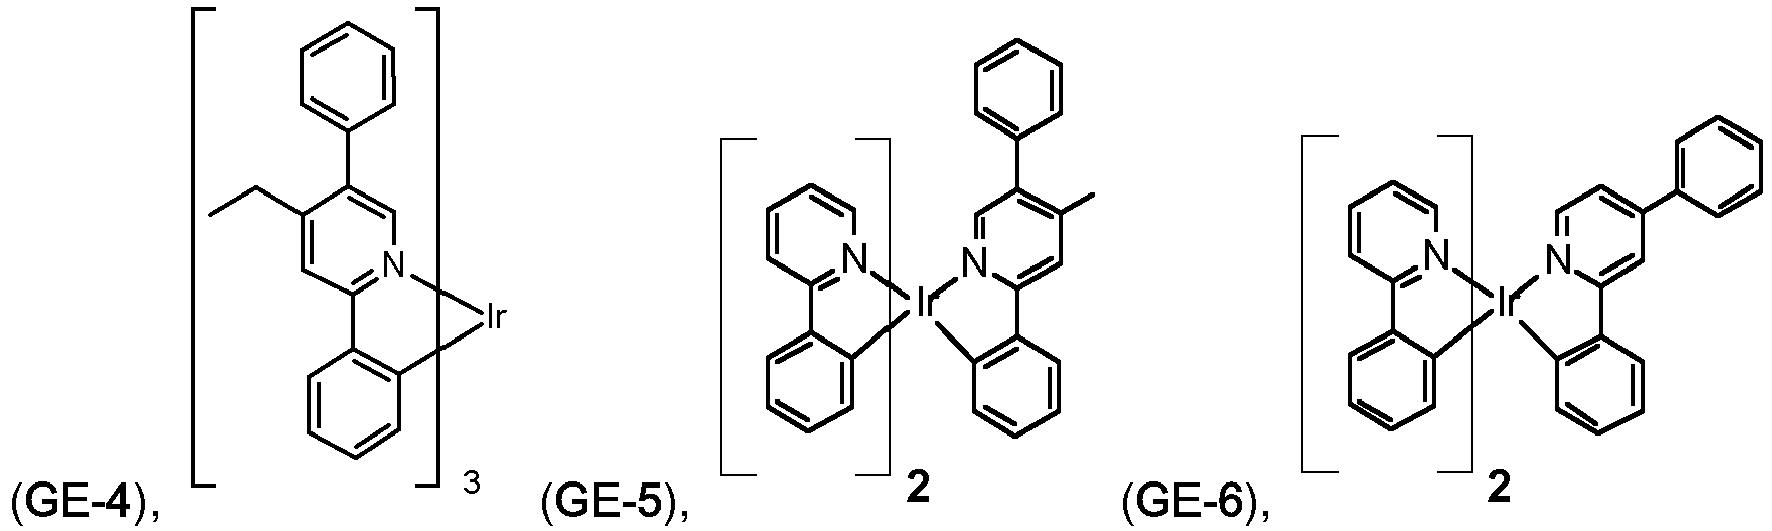 Figure imgb0811